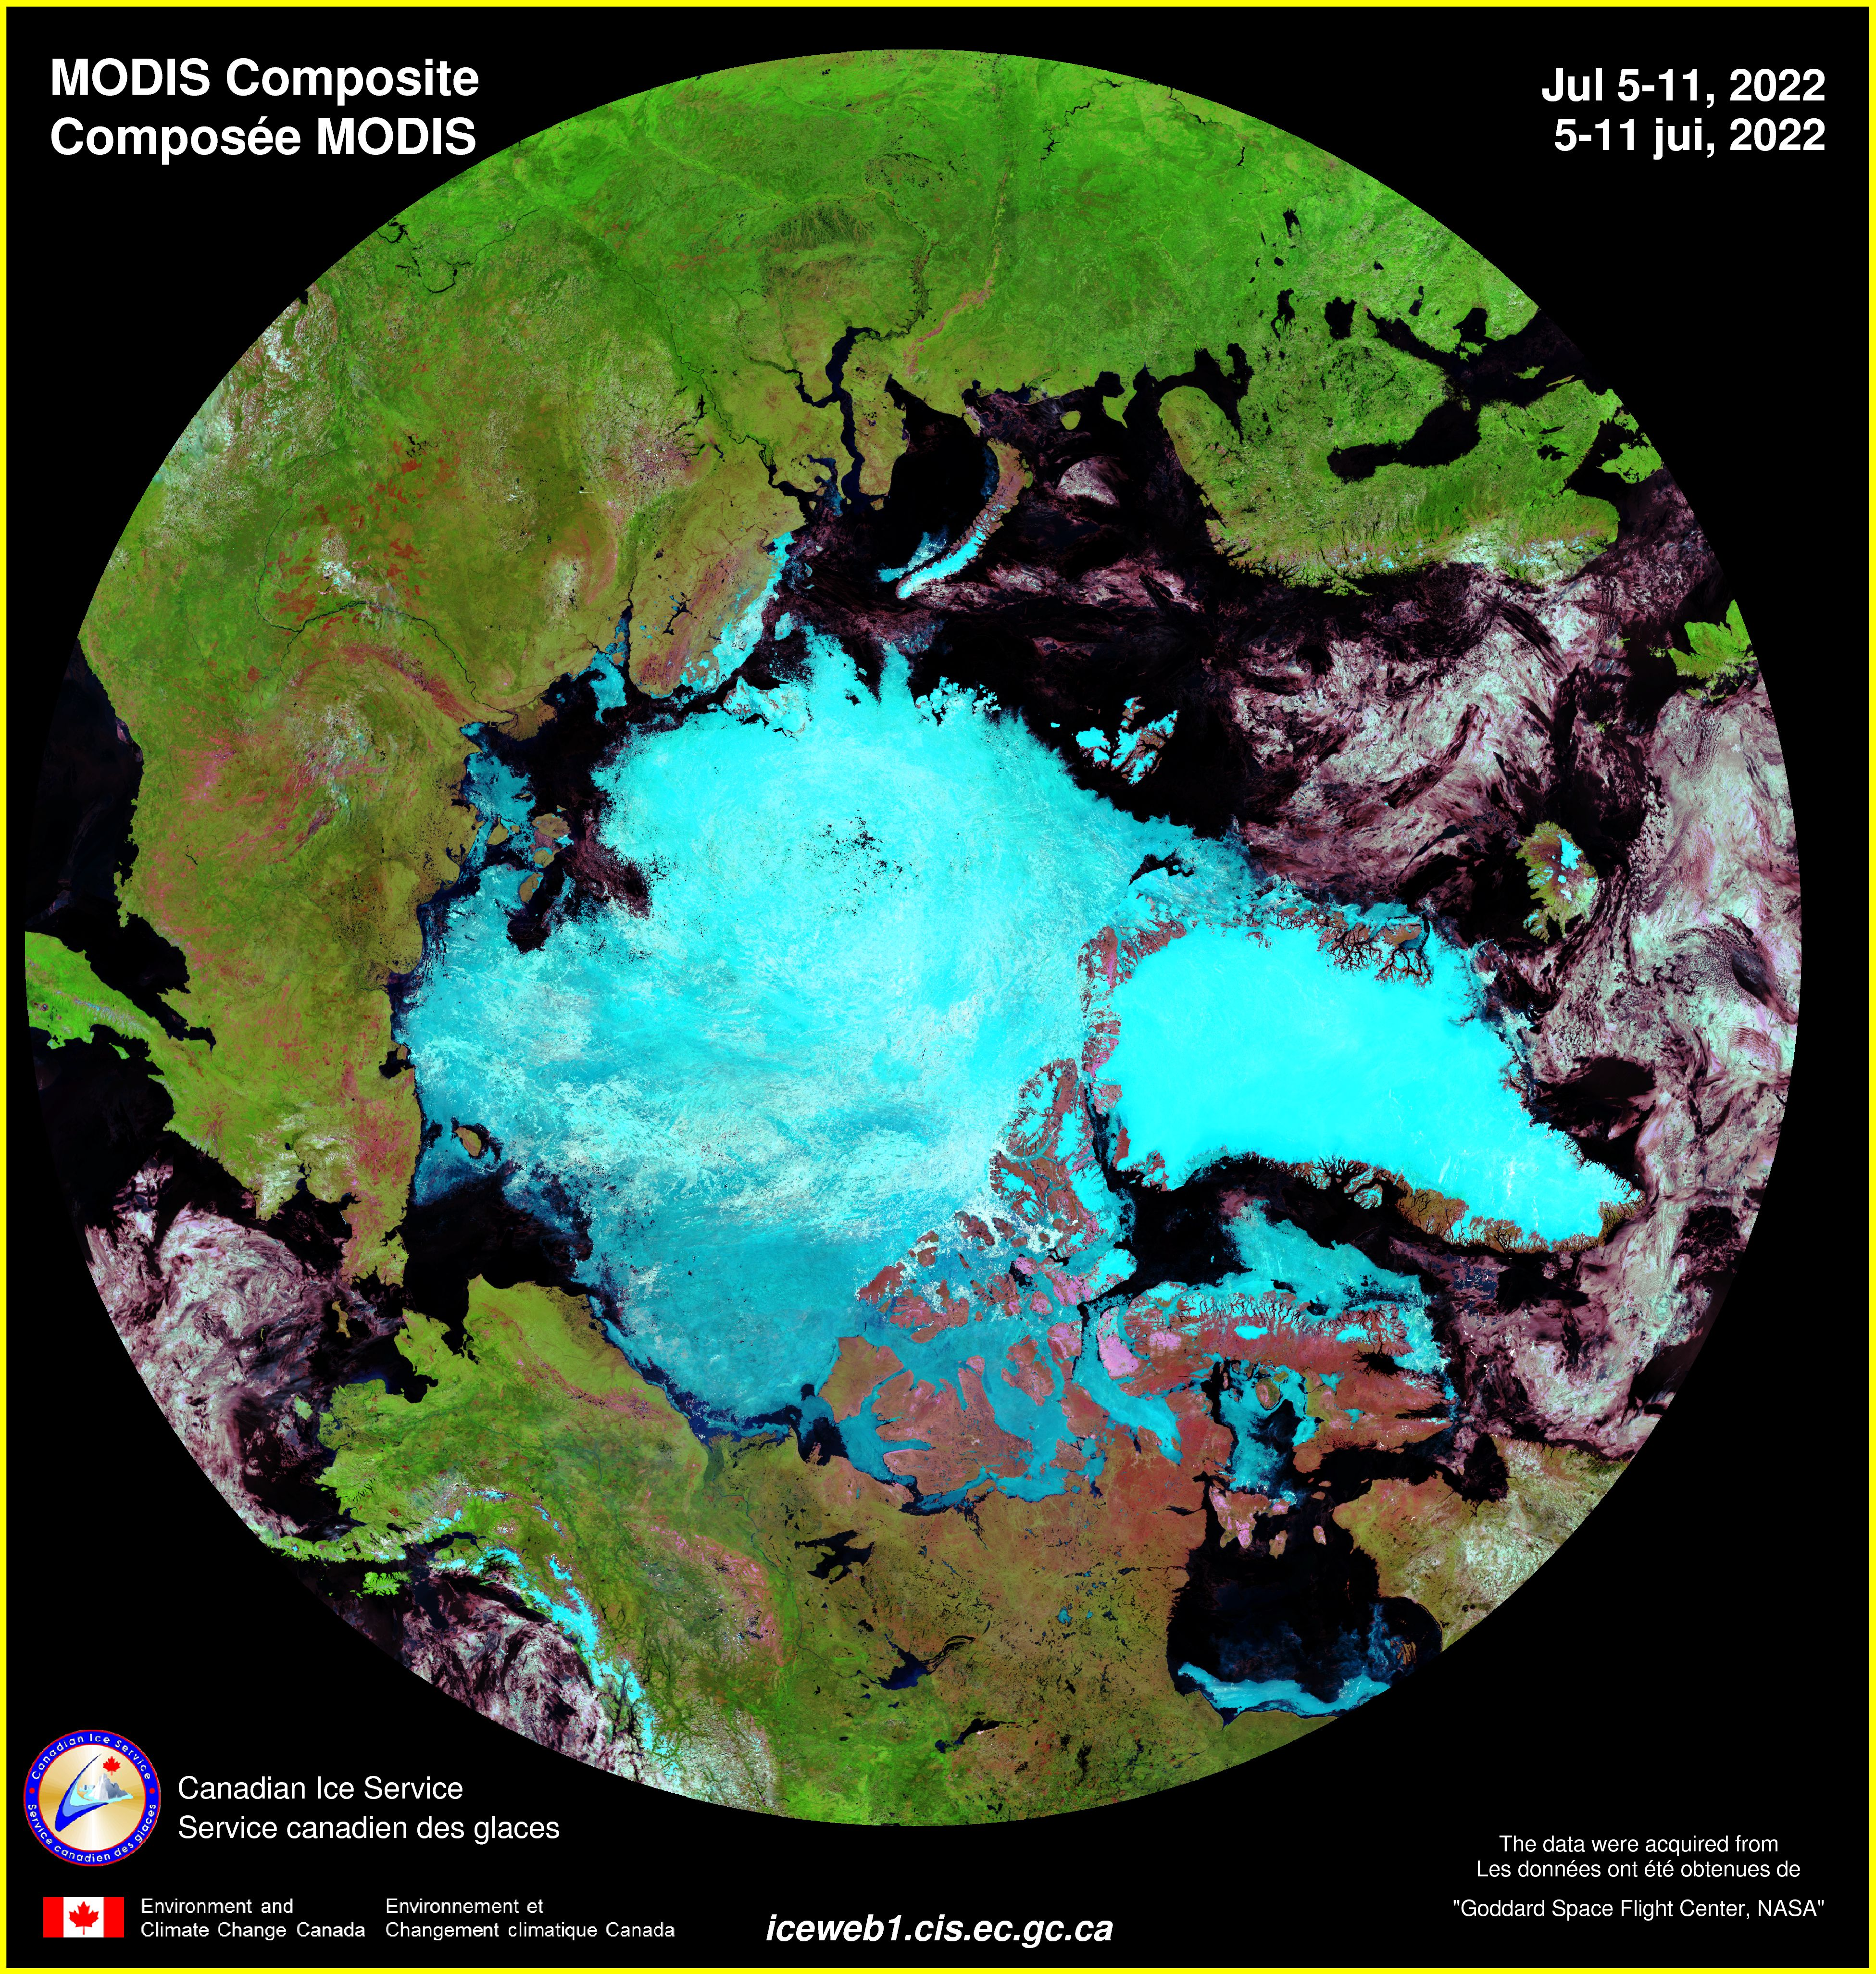 Banquisa Ártico